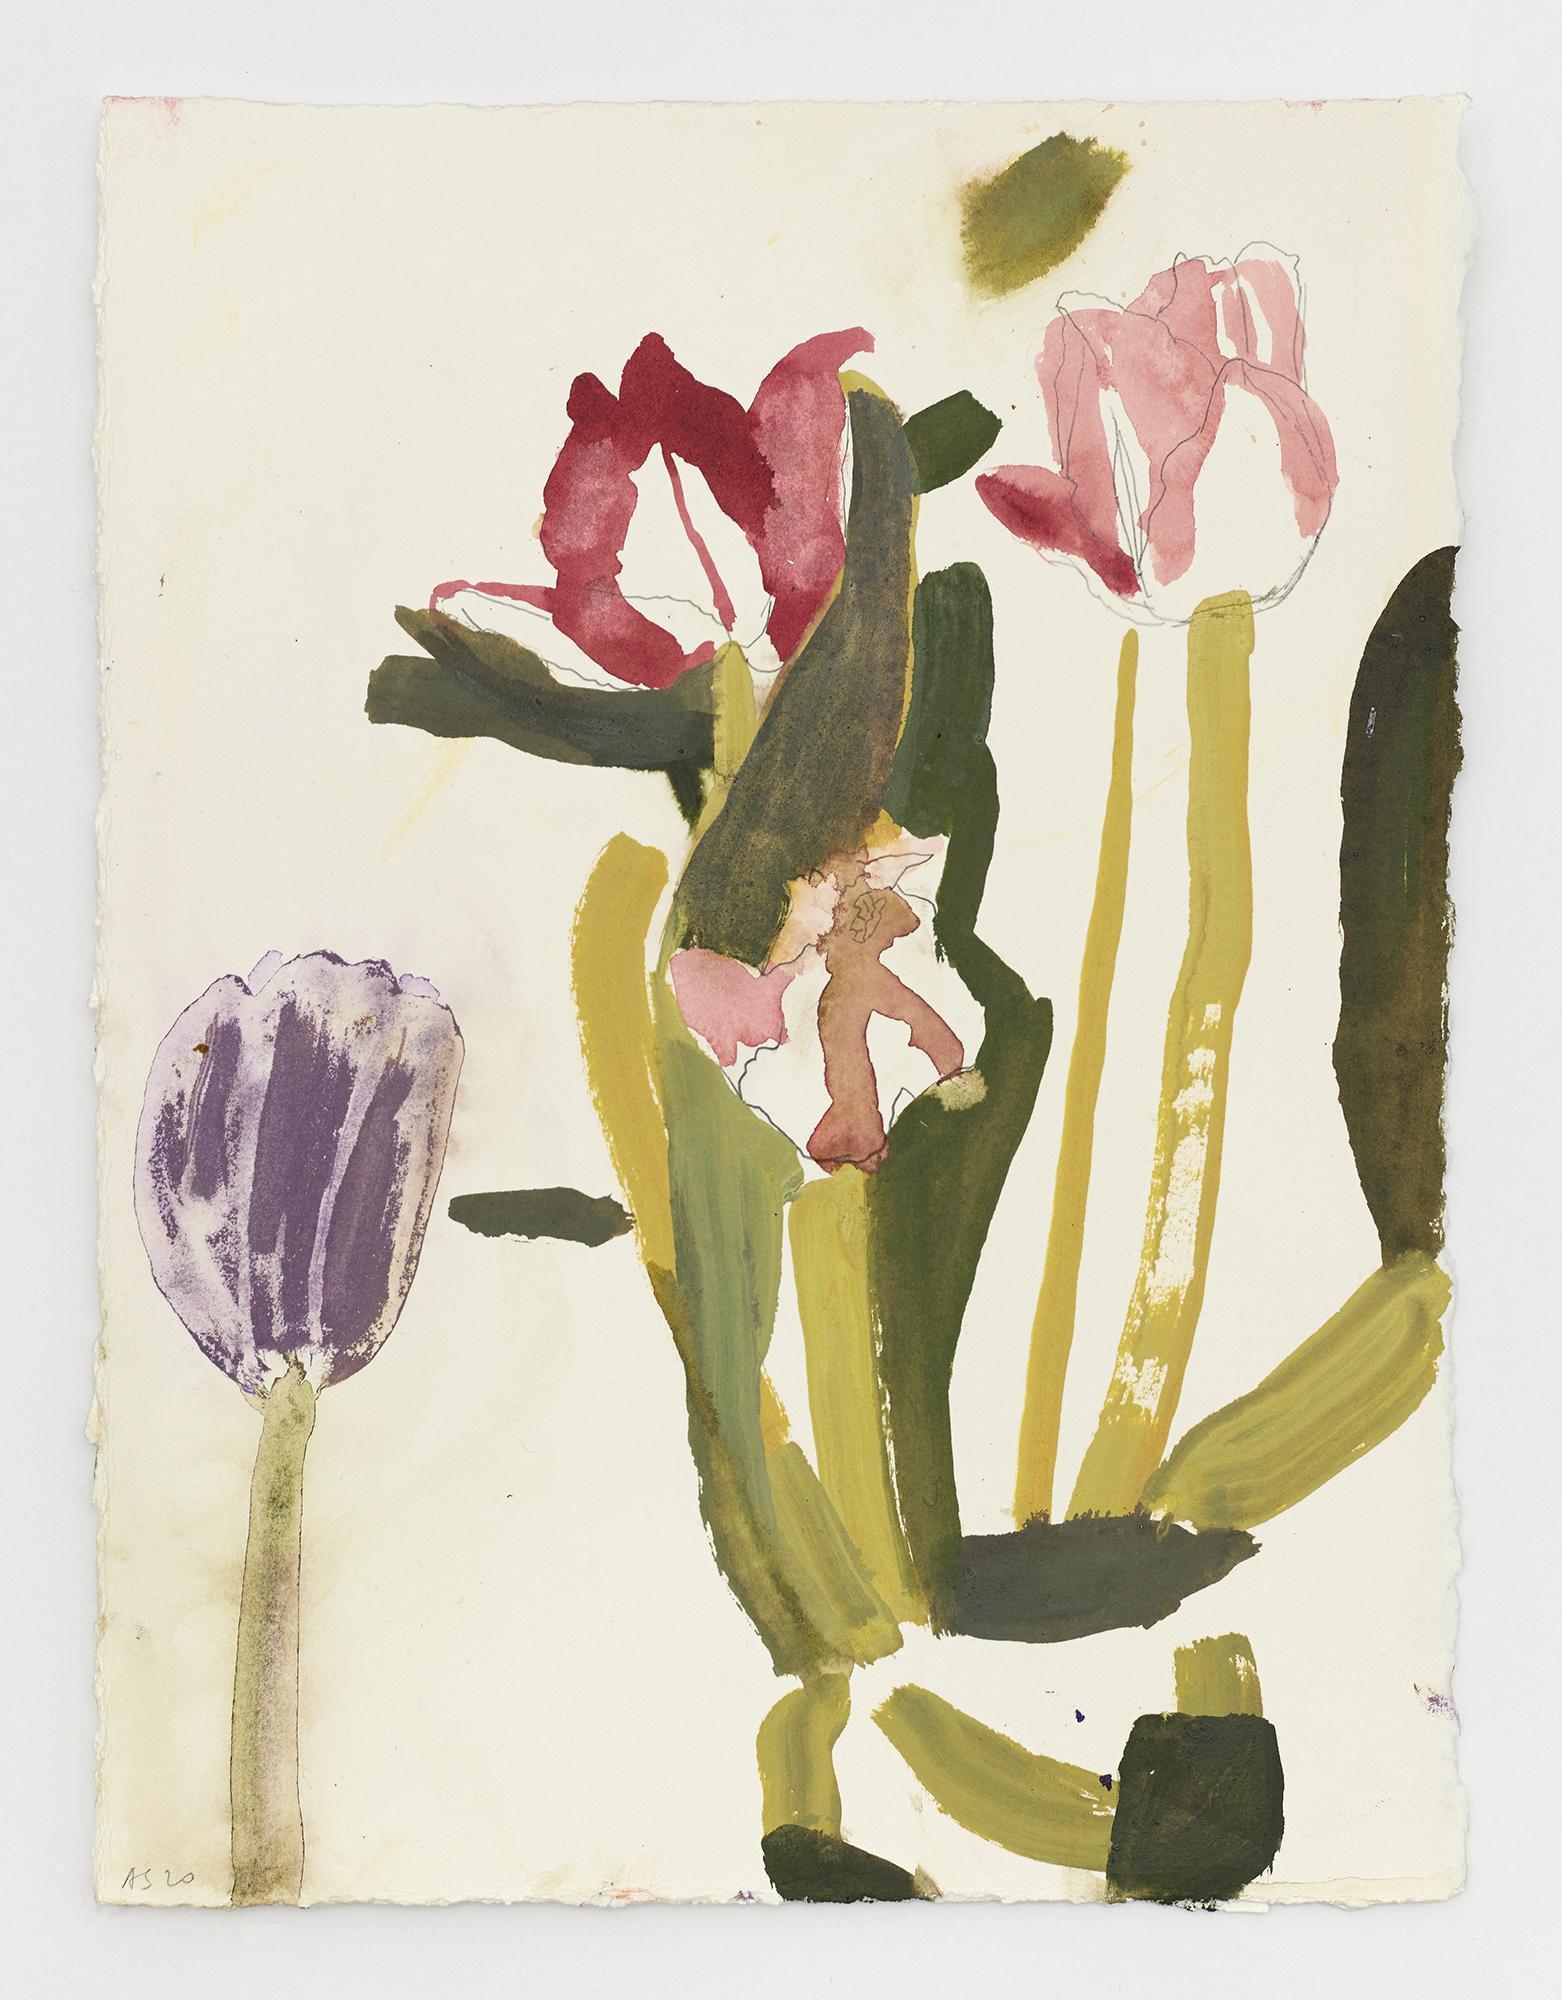 Amy Sillman,/Untitled/, 2020, acrylic on paper, 38.74 × 29.21 cm